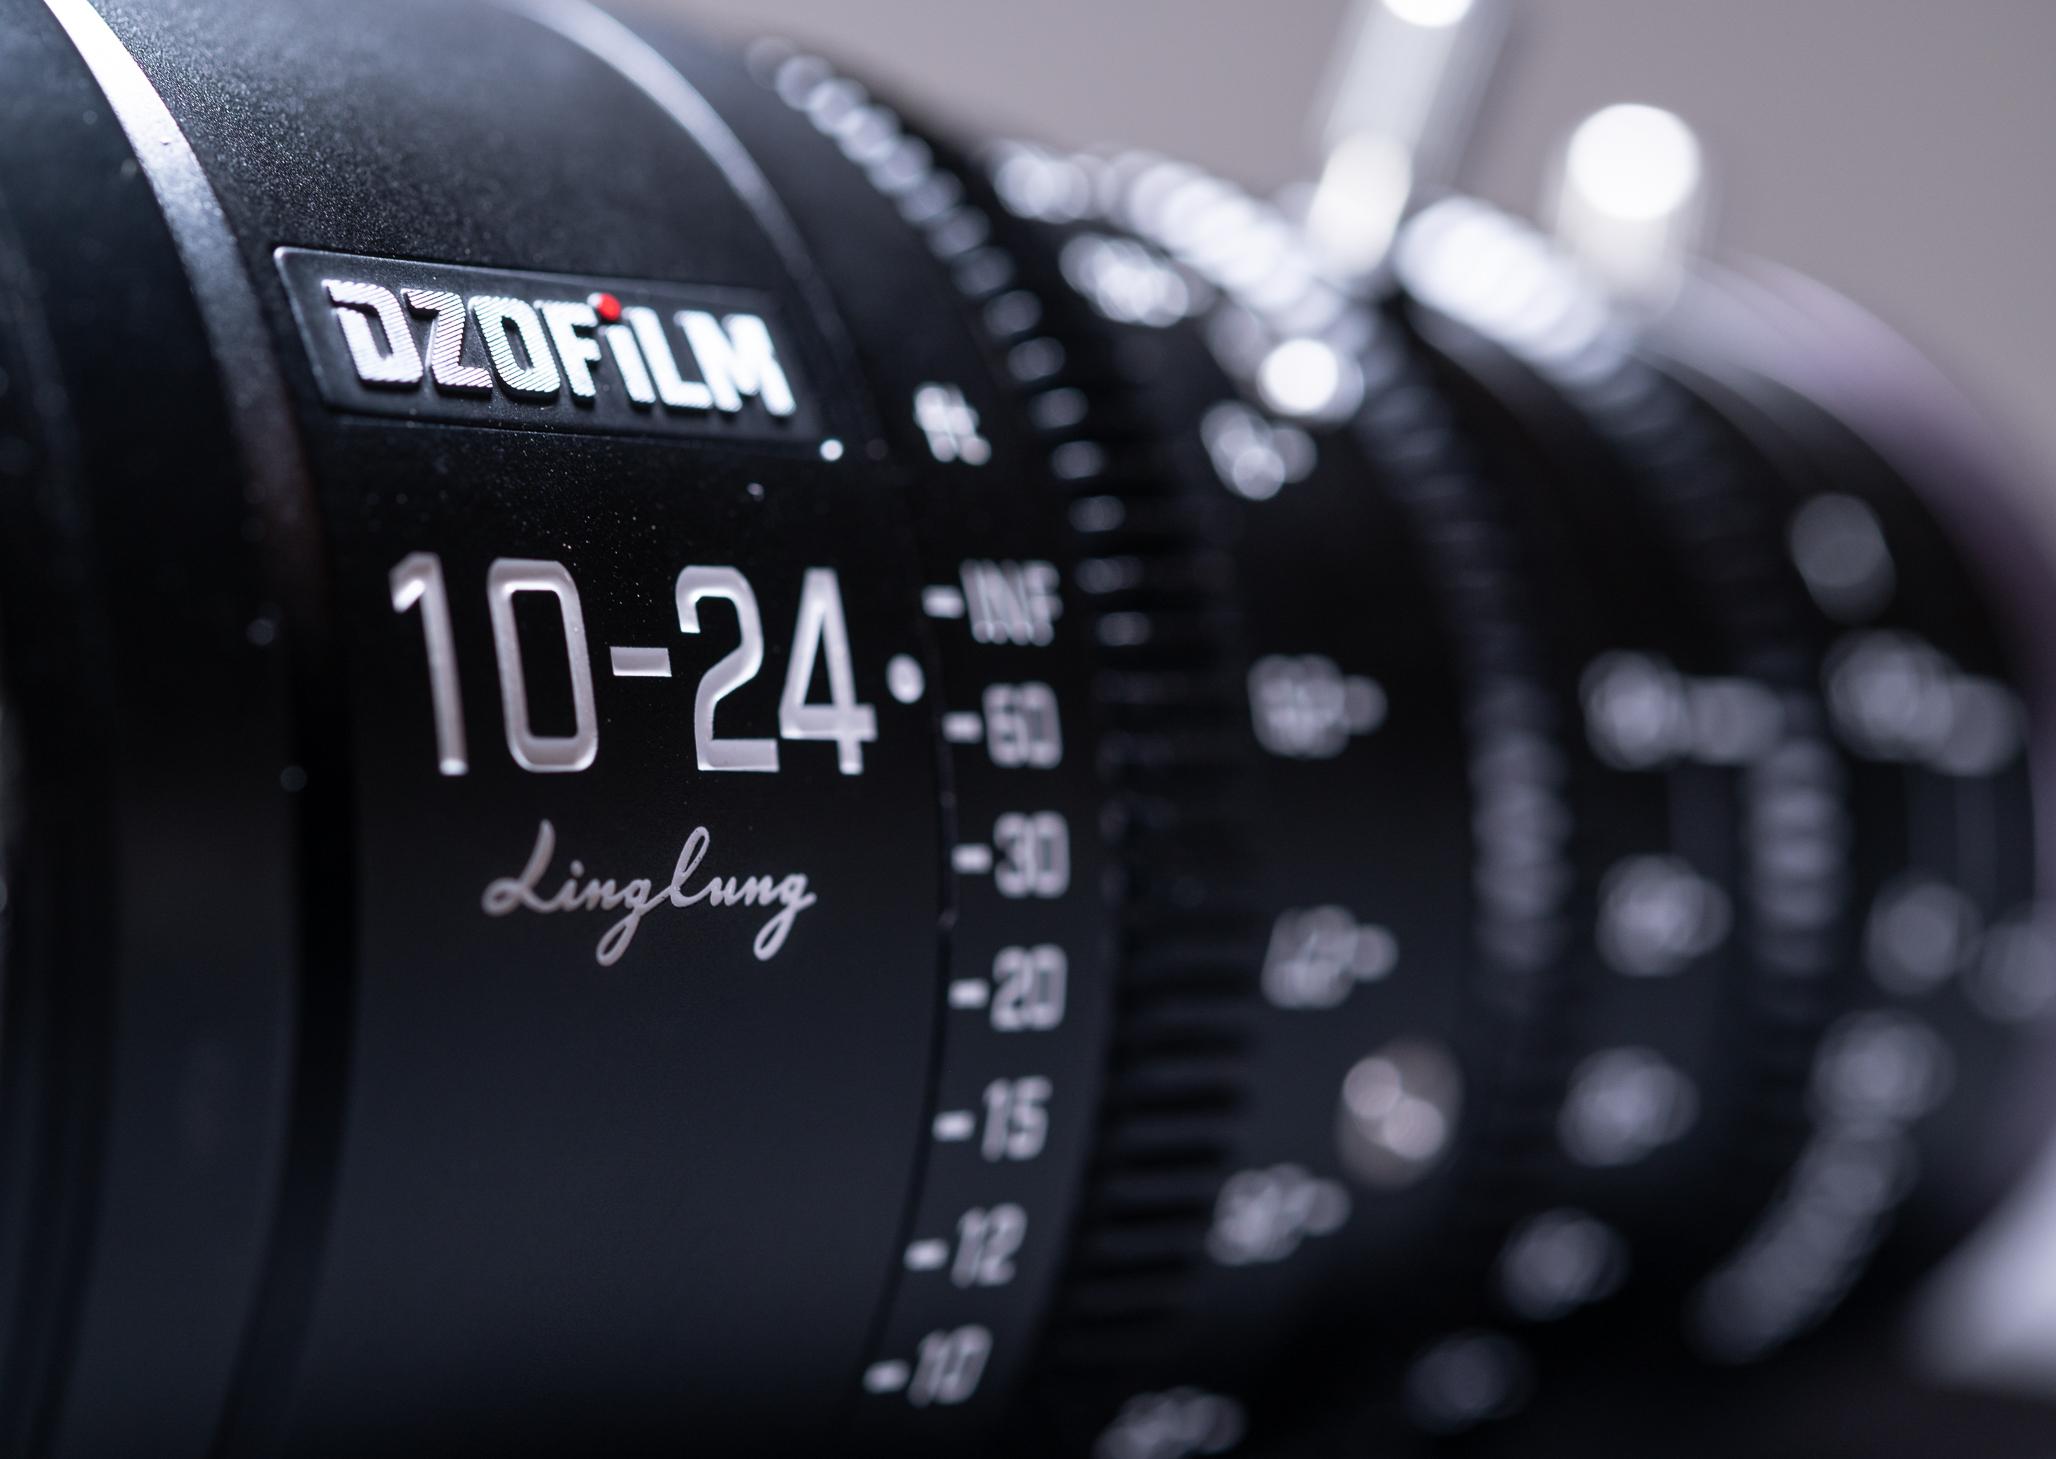 Reviewing The DZOFilm 10-24mm T2.9 M4/3 Cinema Lens 3